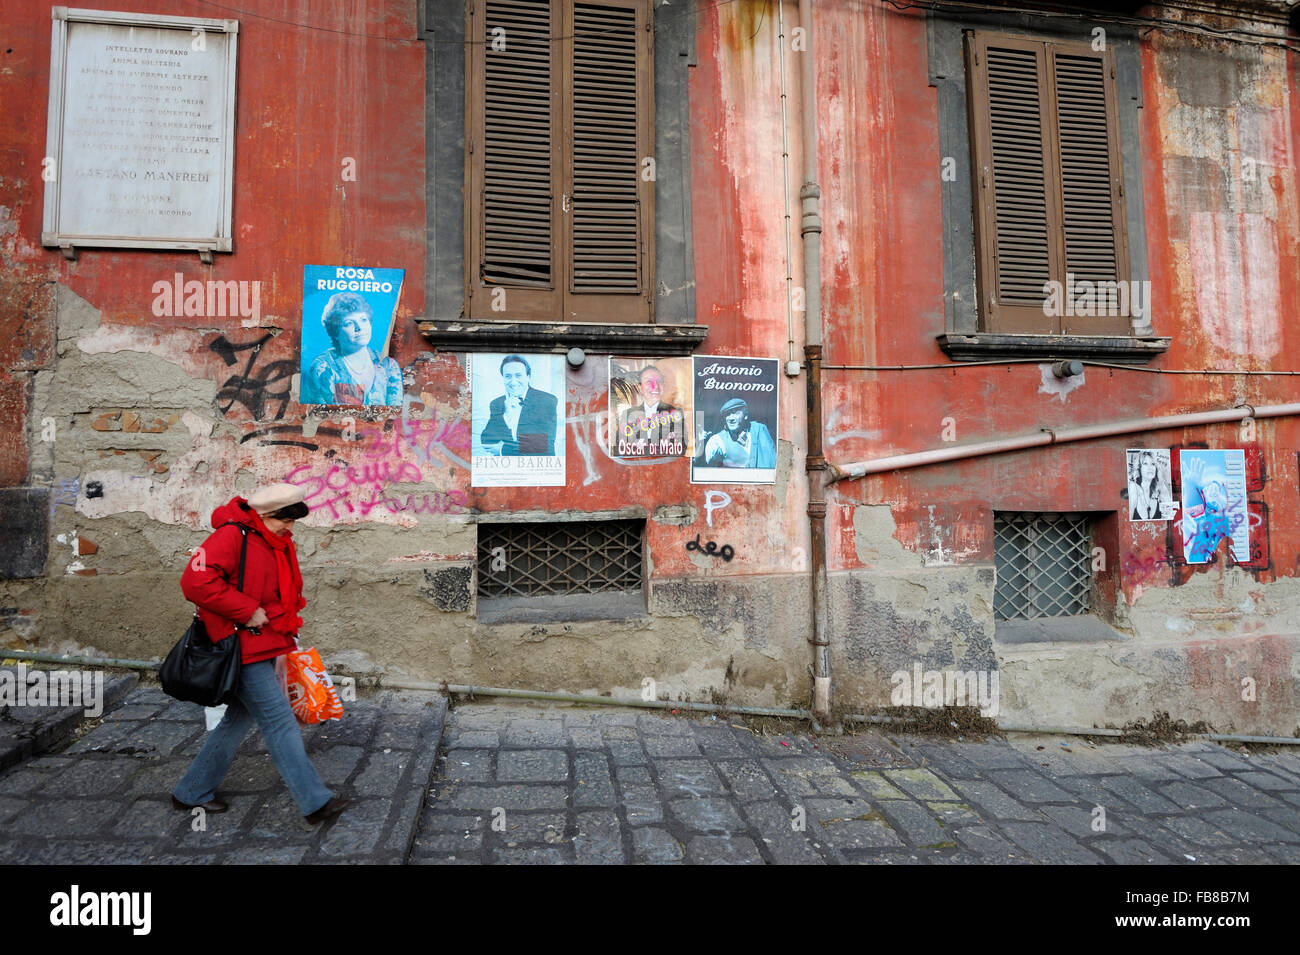 Via San Giuseppe dei Nudi, Quatiere Avvocata, Napoli, Campania, Italy - Stock Image